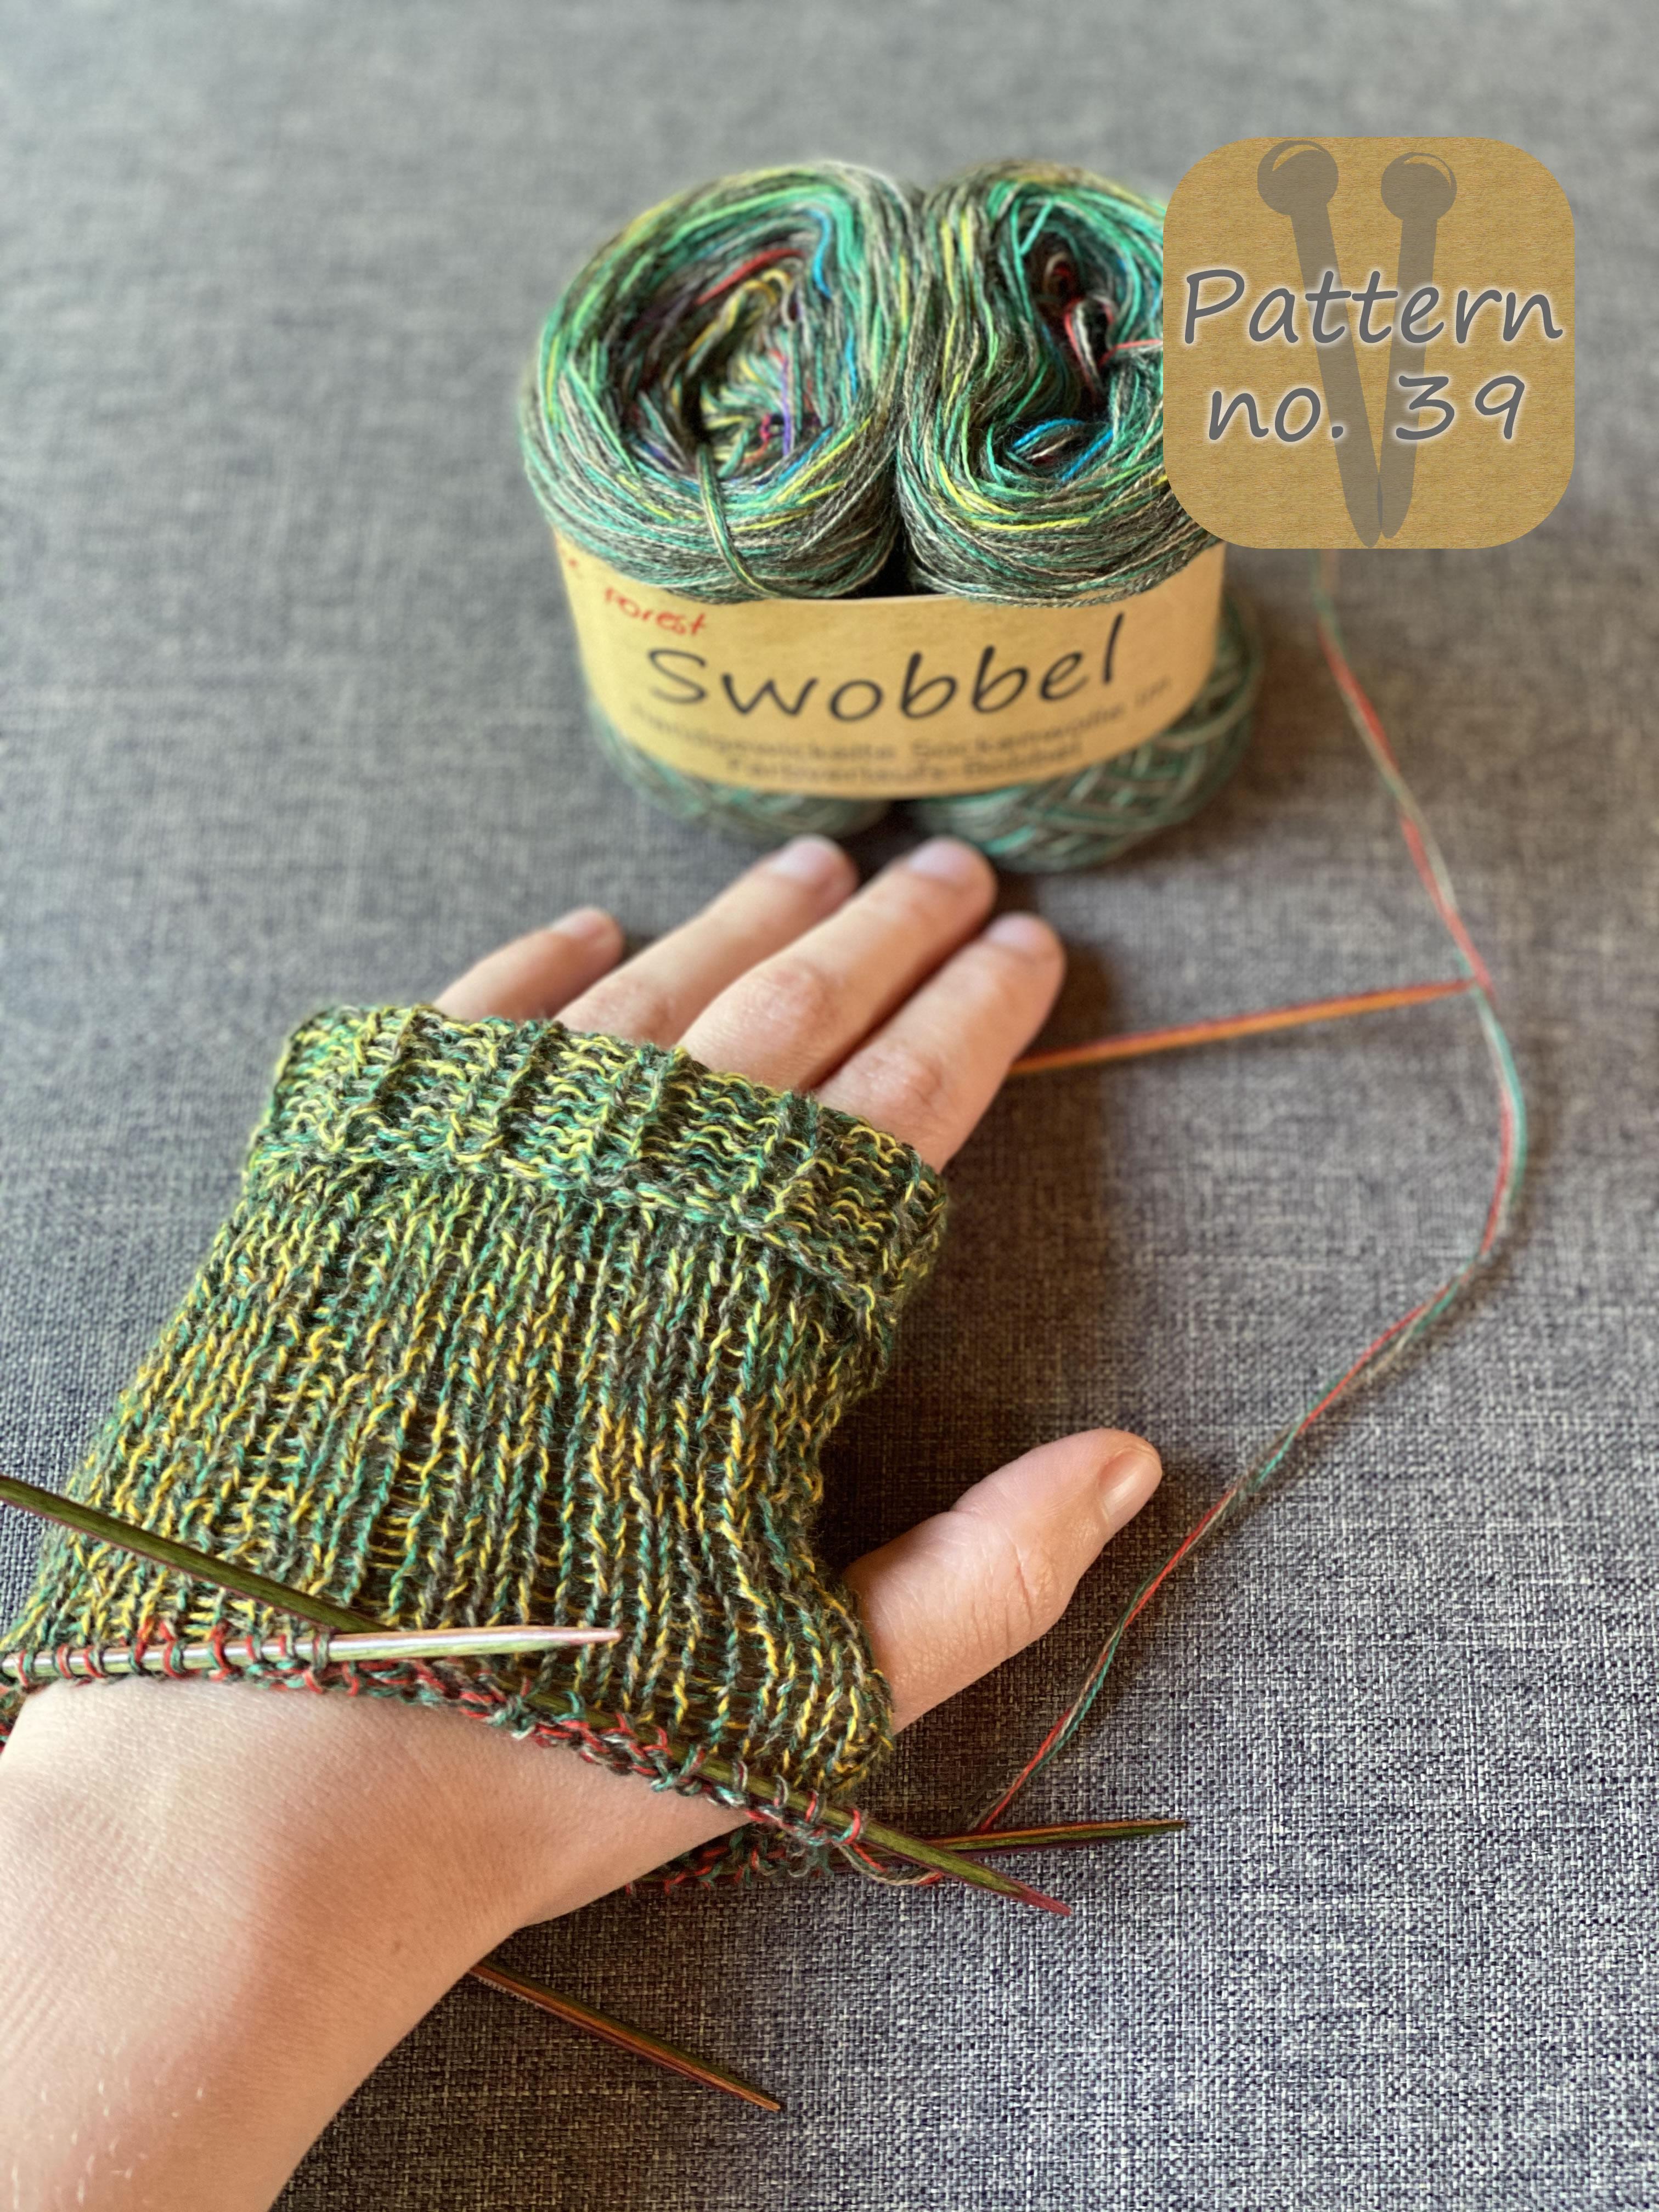 Swobbel Sockenwolle handgewickelter Farbverlaufs-Bobbel